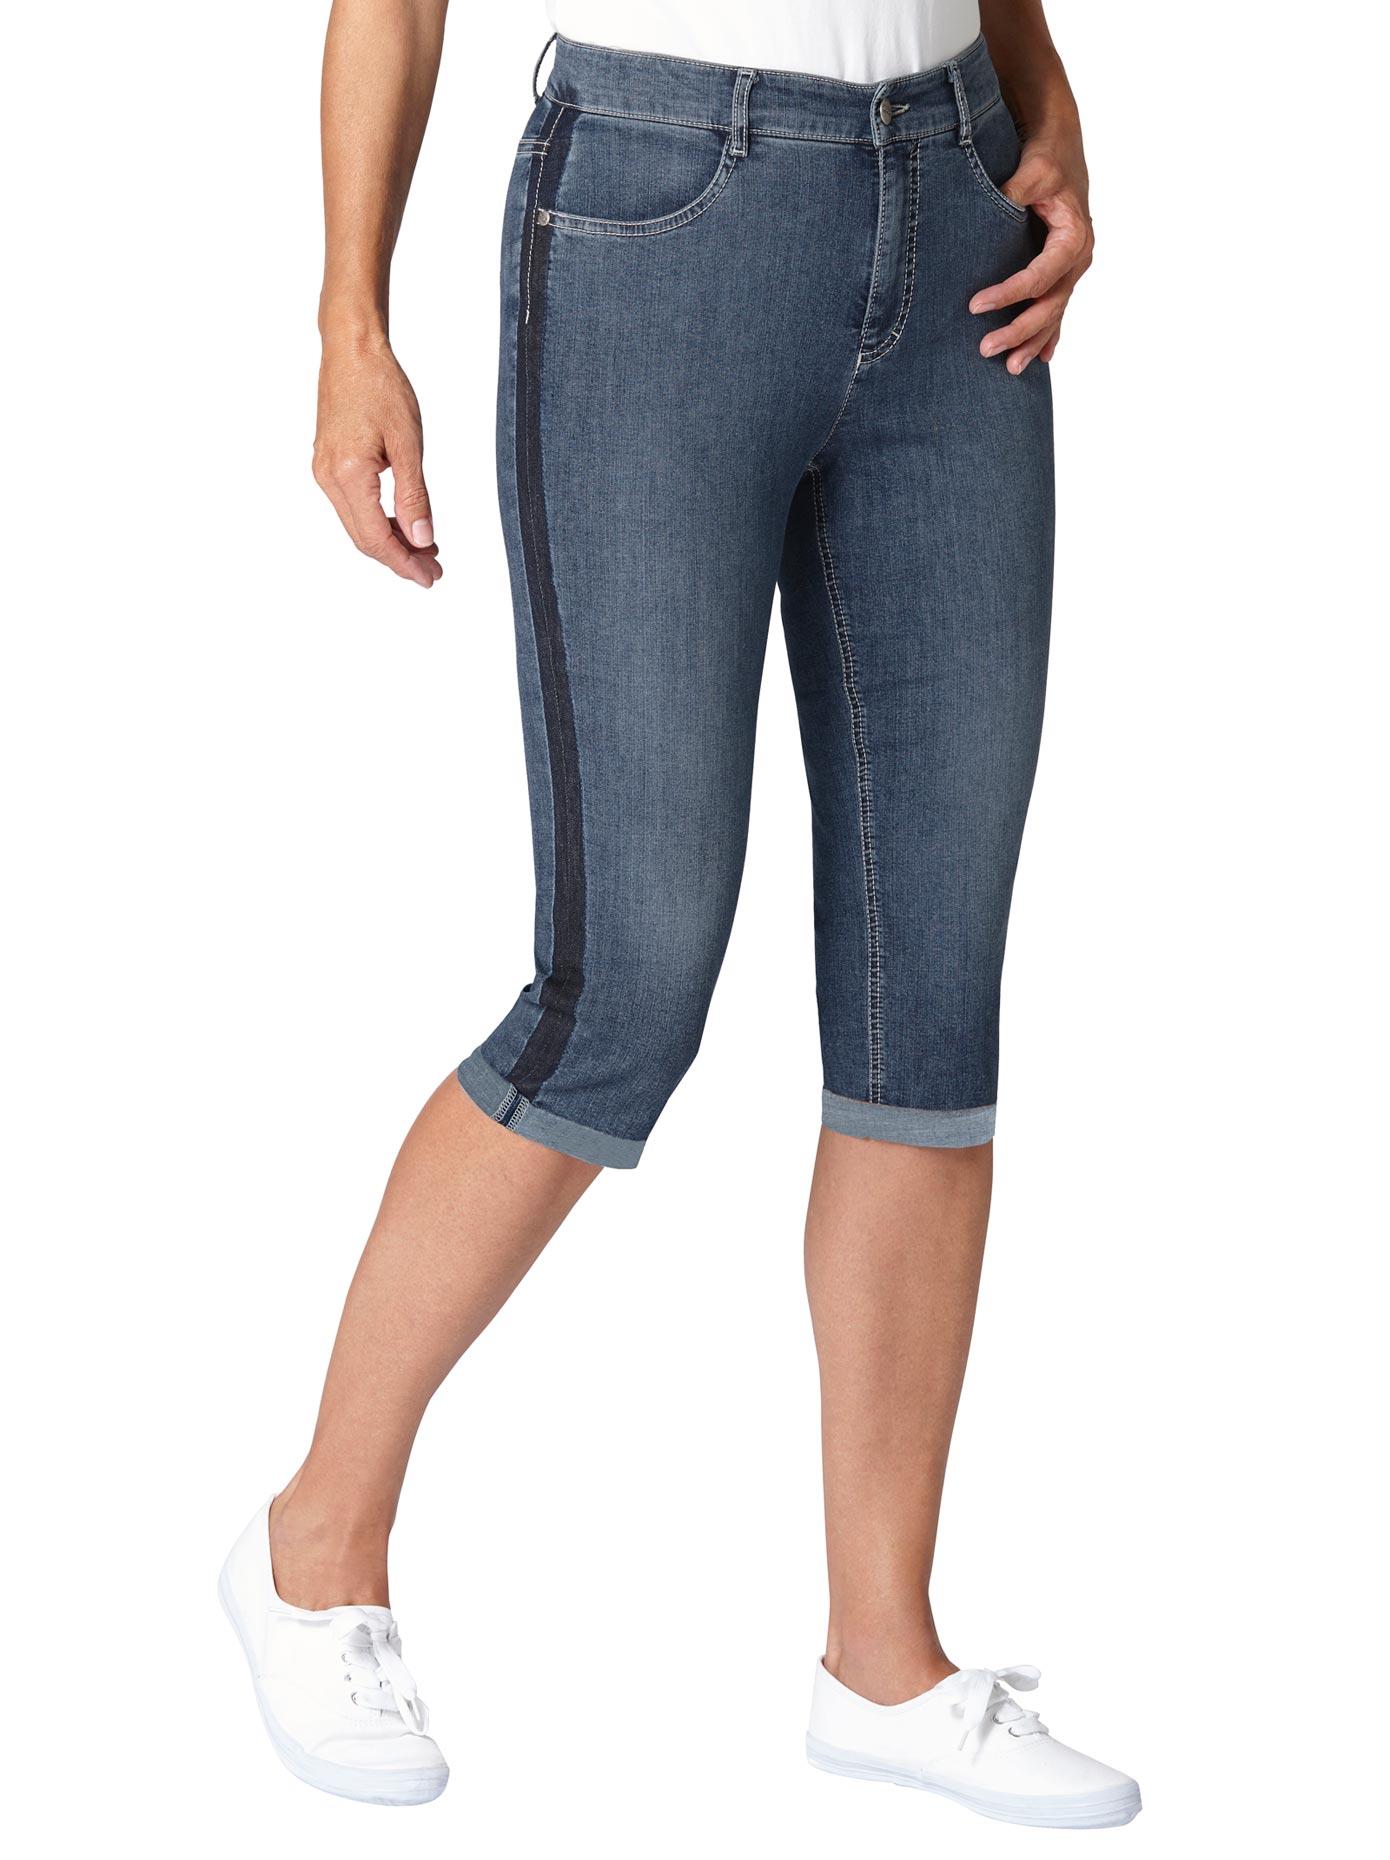 Image of Ascari Capri-Jeans mit seitlicher Kontrast-Waschung